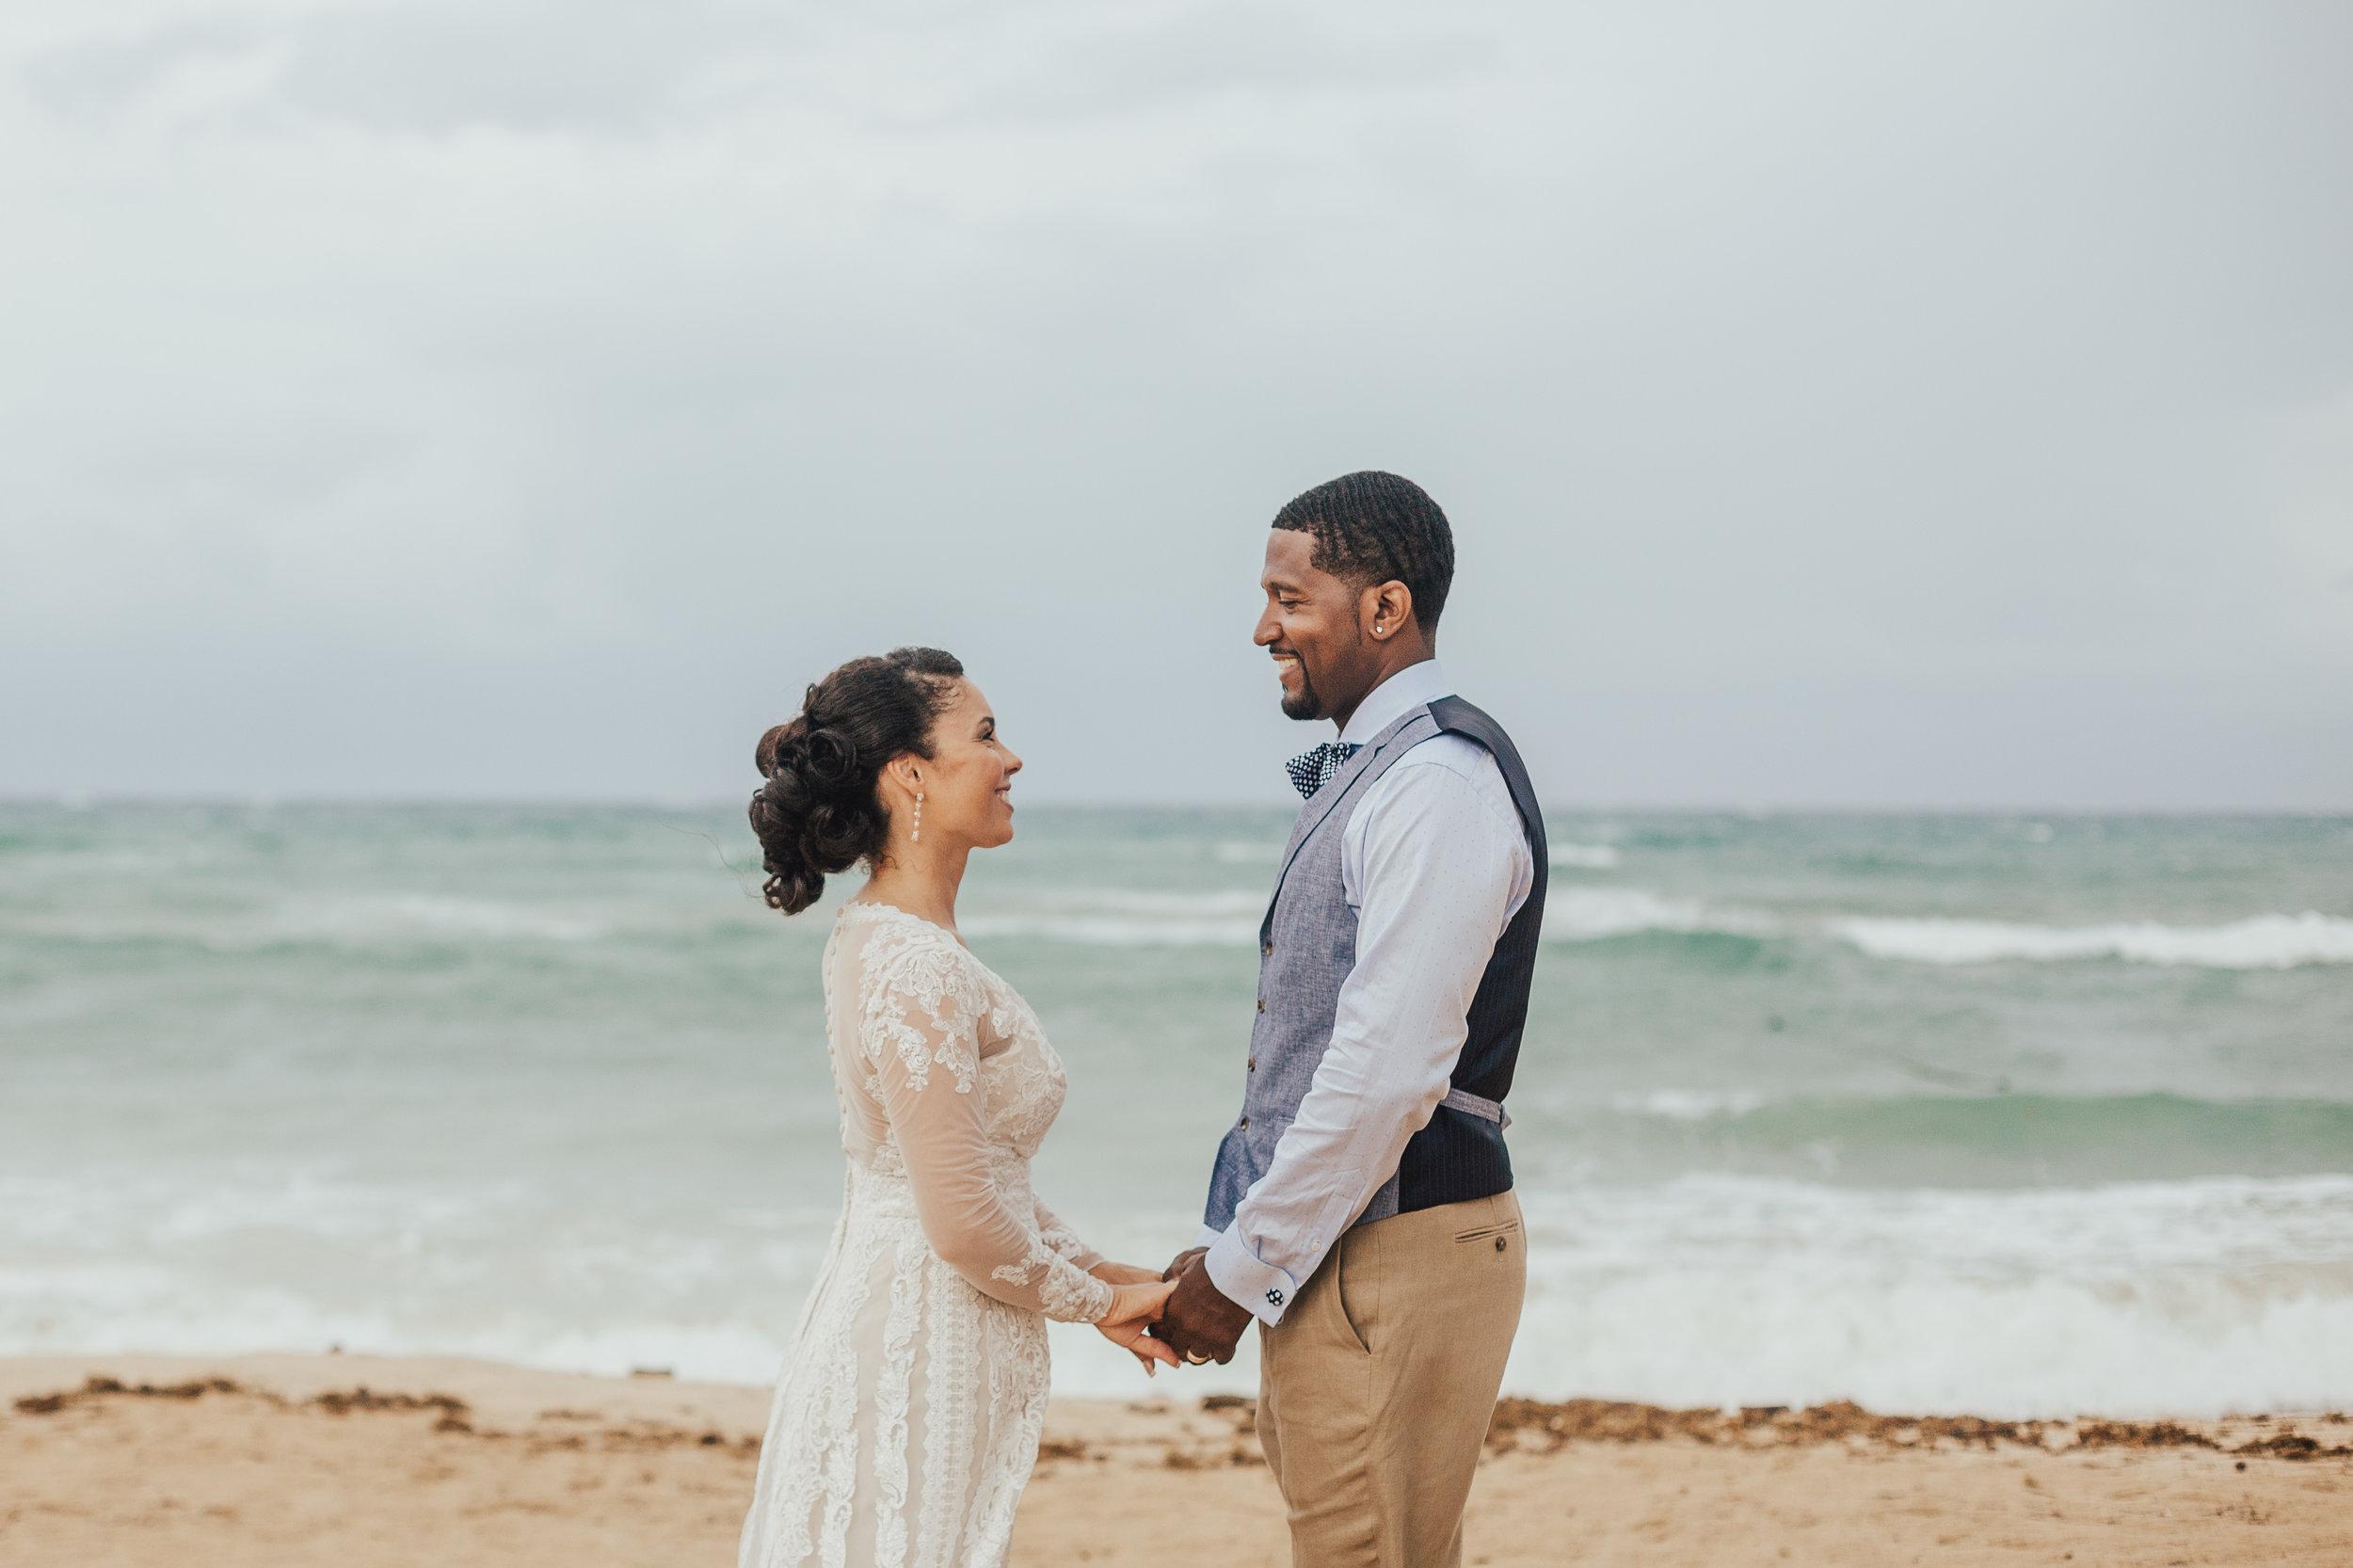 Destination-Wedding-Photographer-cleveland-wedding-photographer-elopement-photographer-elope-beach-bali-wedding